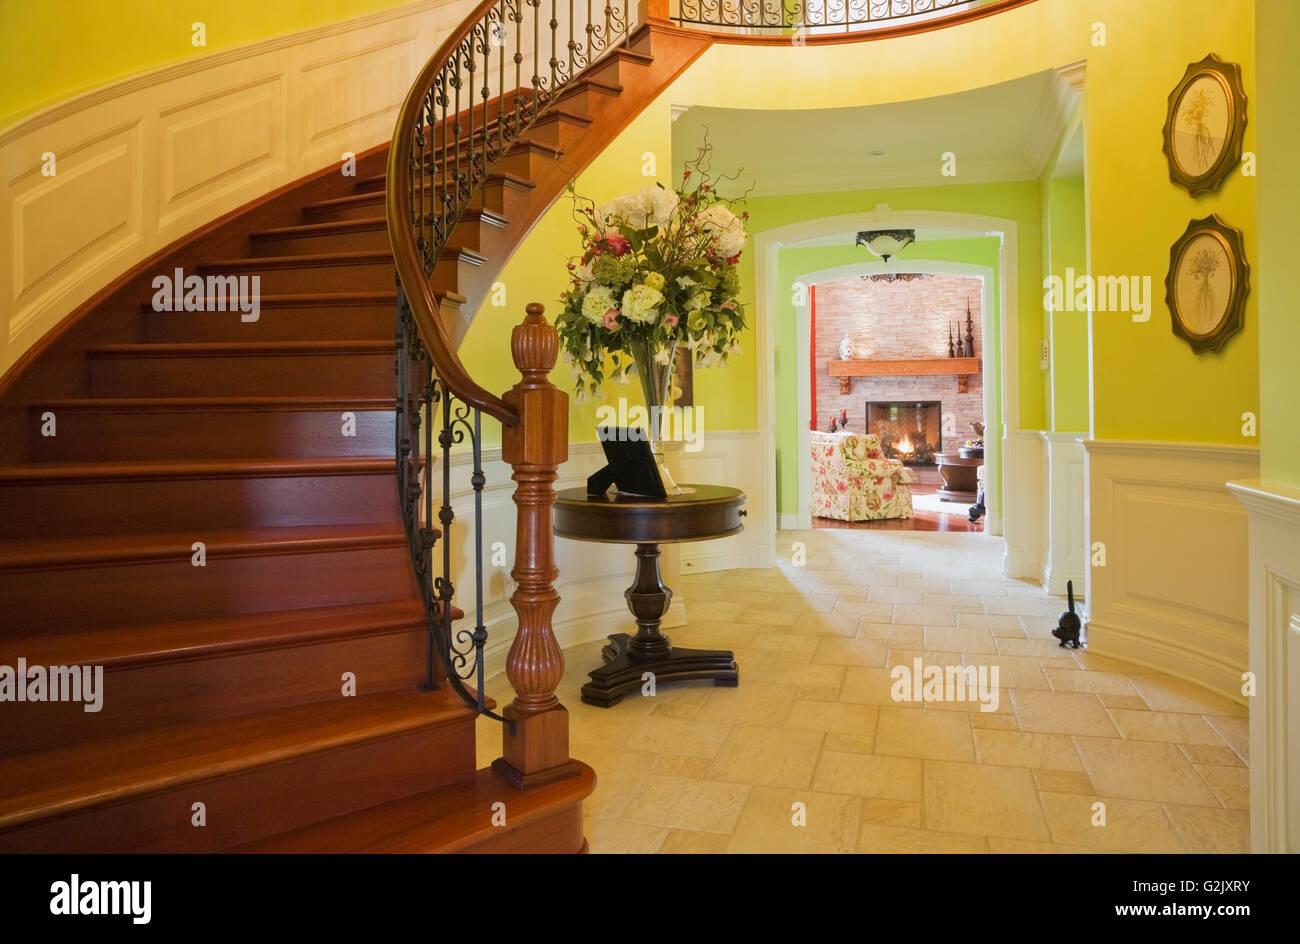 Groovy Curved Wooden Staircase Hallway Leading Living Room Lit Gas Interior Design Ideas Truasarkarijobsexamcom